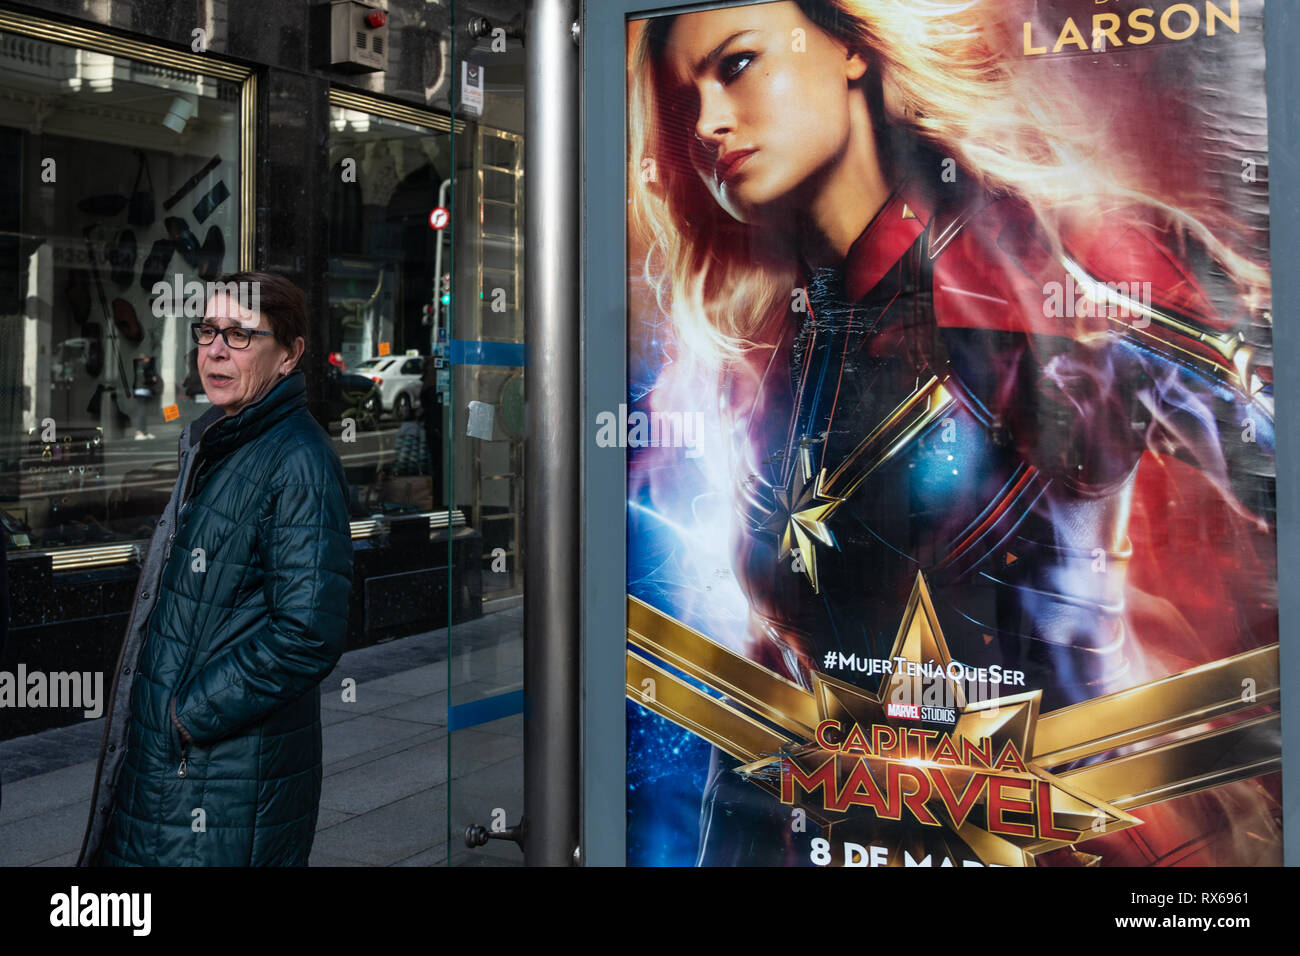 Madrid, Spain  8th Mar, 2019  A women movie advertisement